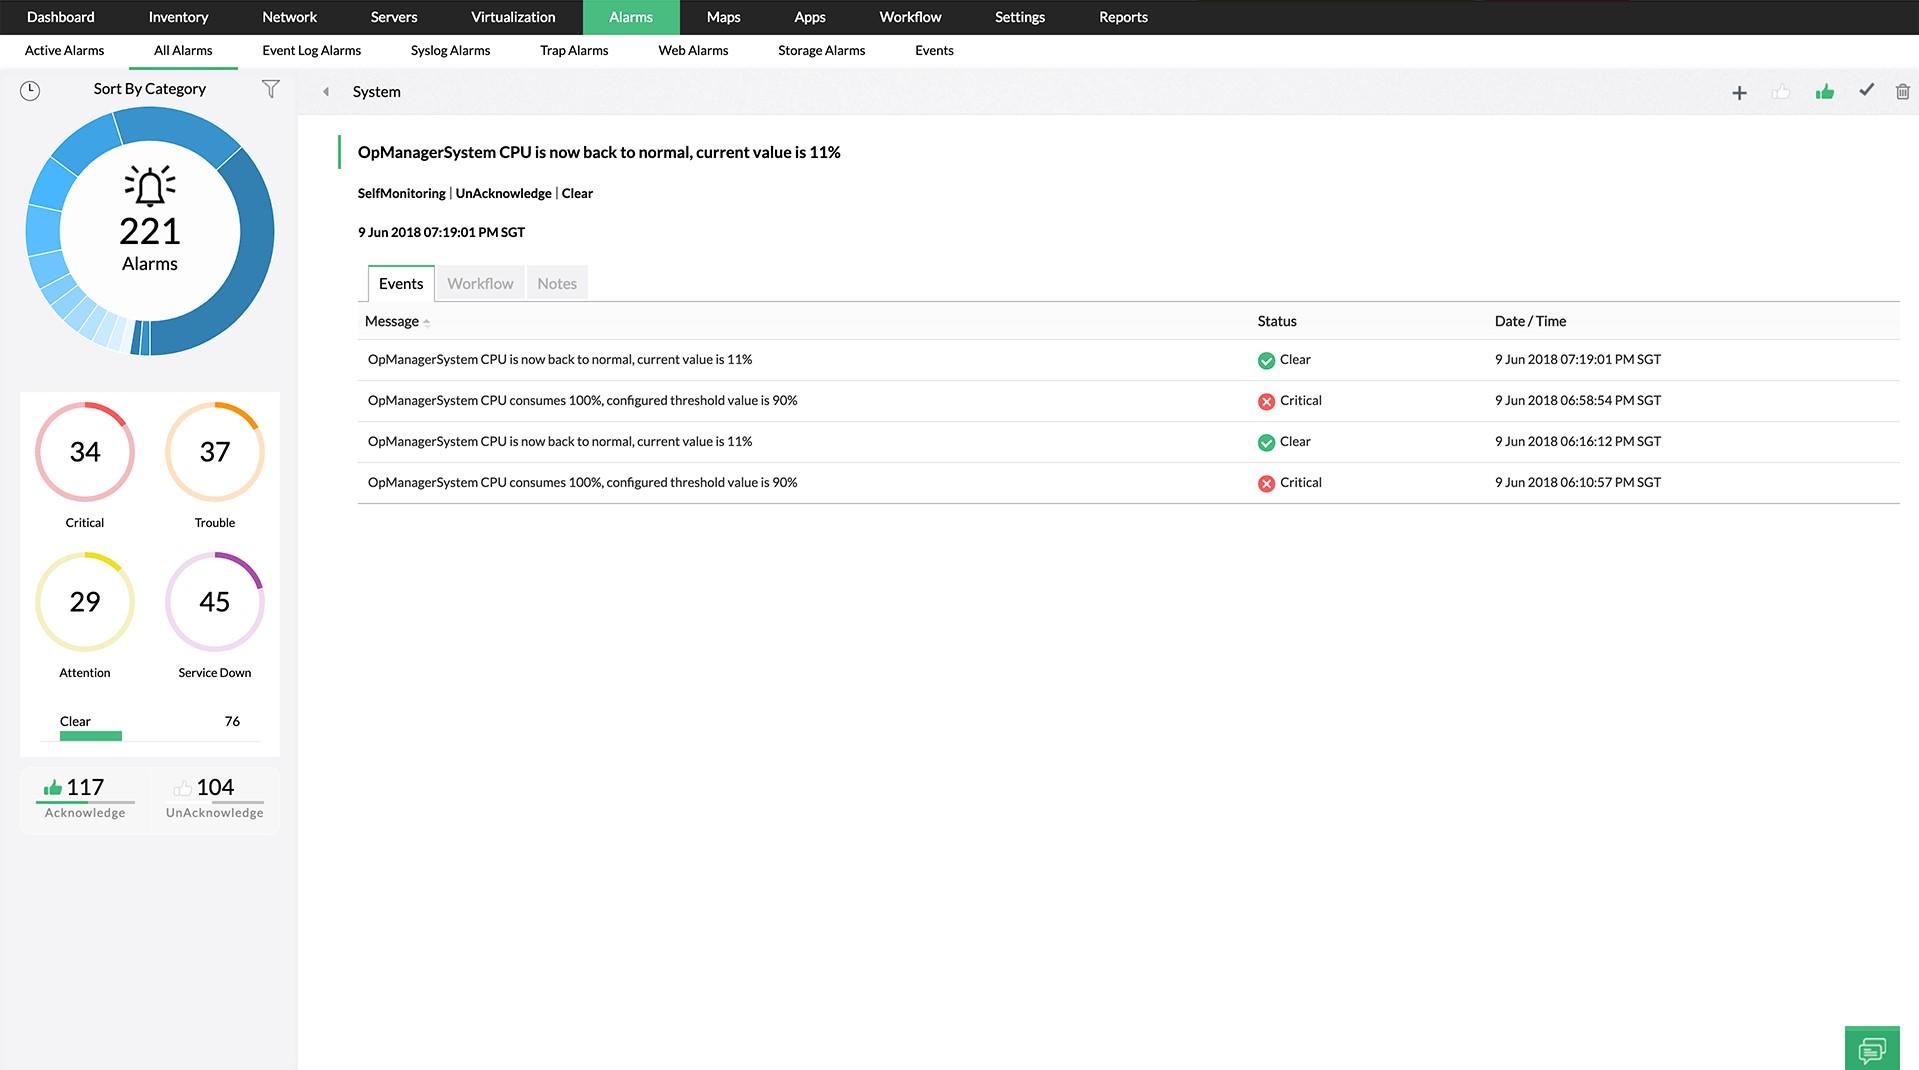 CPU Utilization Threshold Value